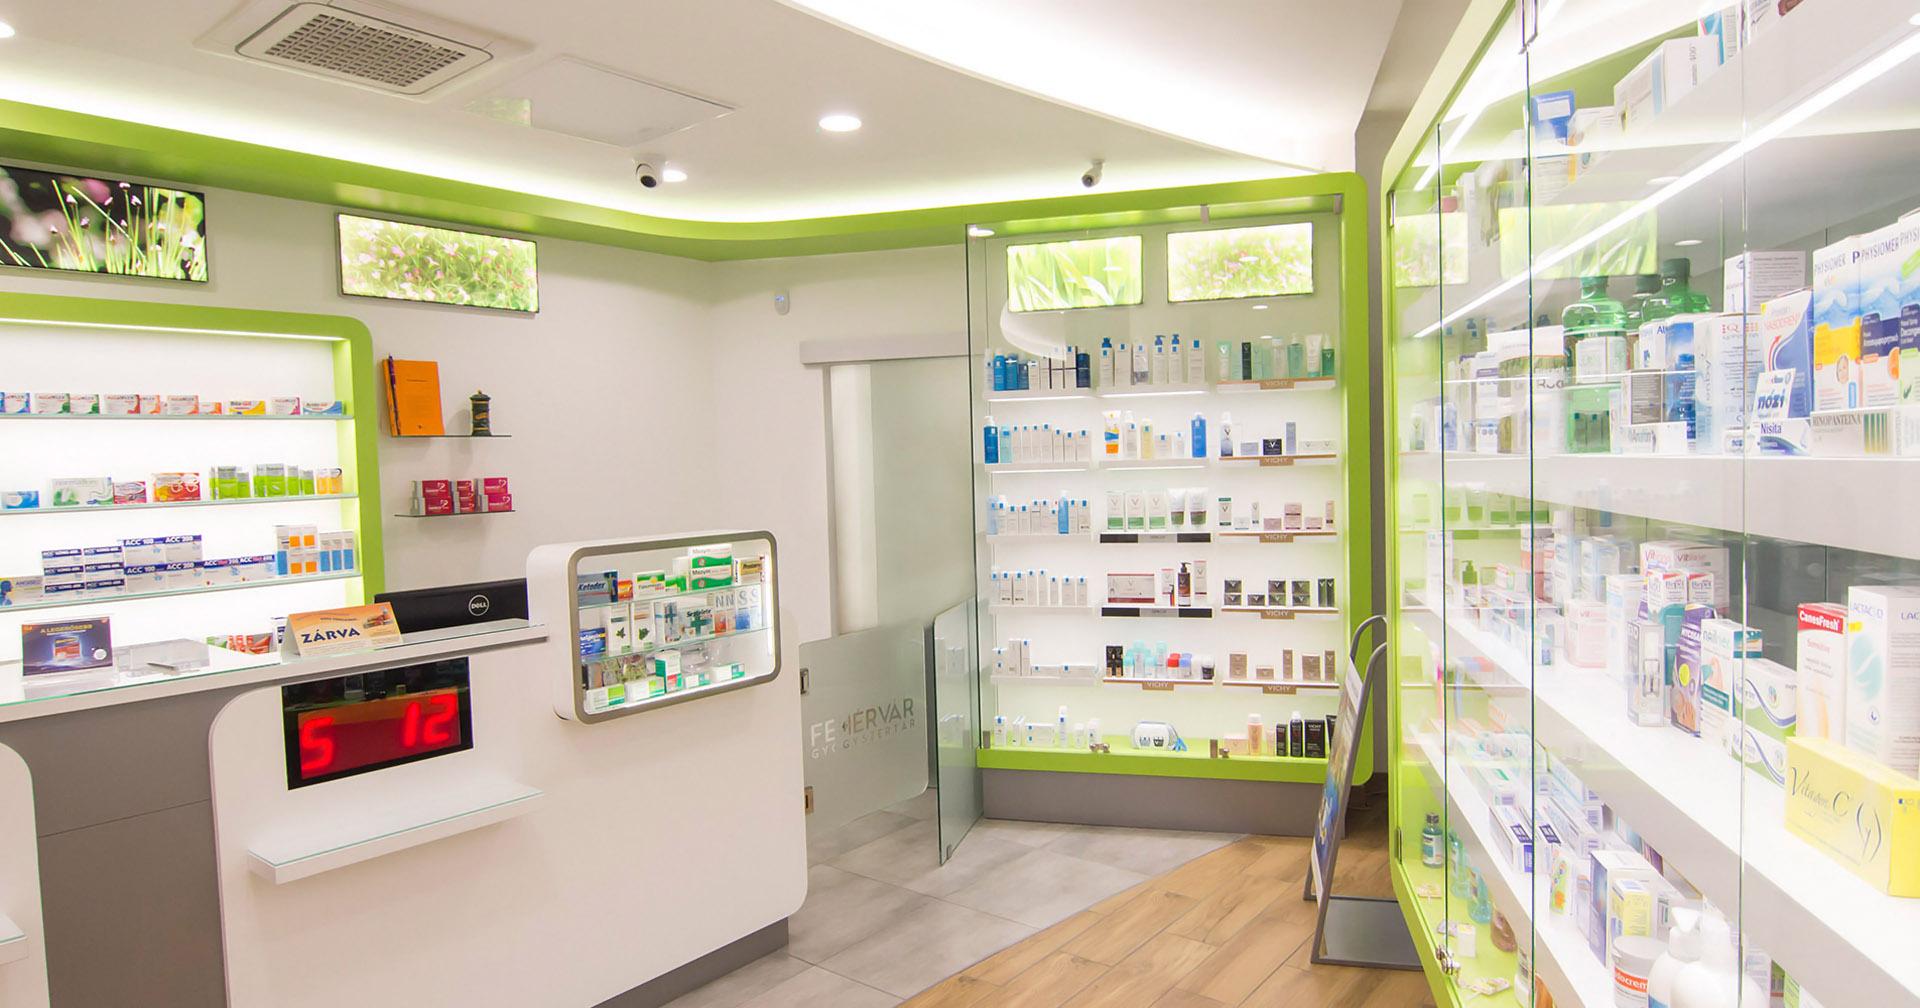 The future pharmacy design